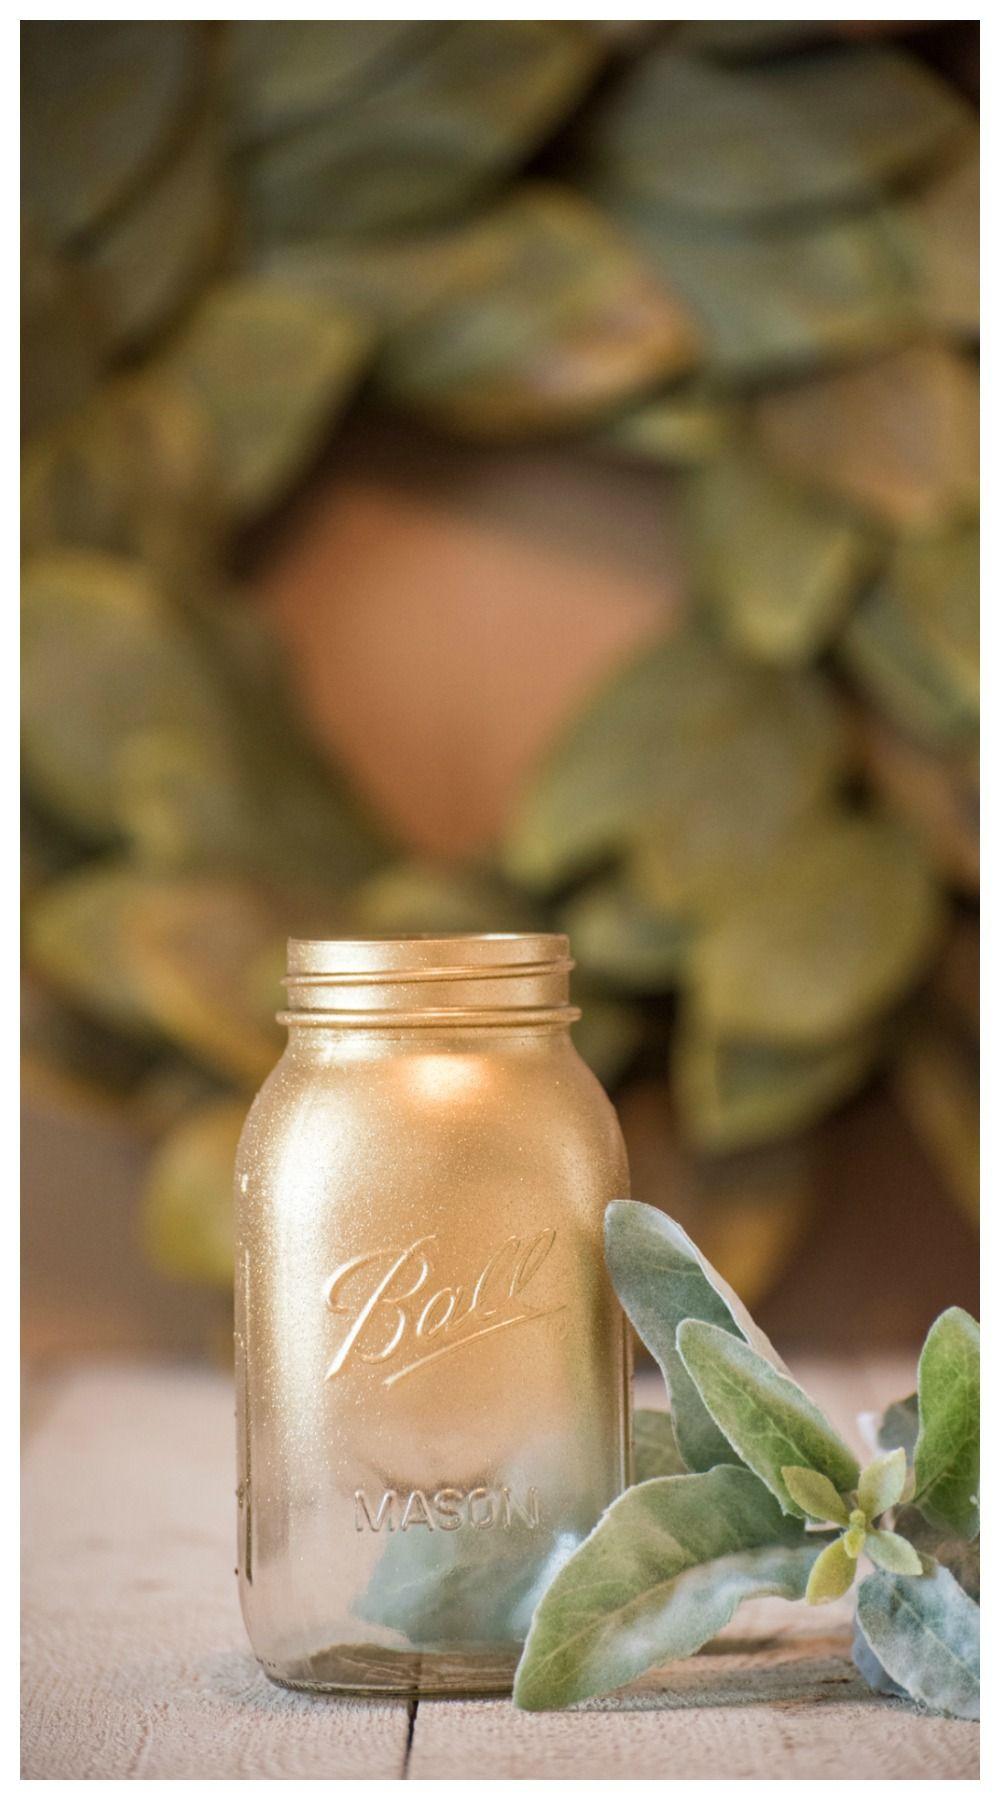 rose gold glitter vase of mason jar wedding centerpiece vase flowers greenery gold glitter throughout mason jar wedding centerpiece vase flowers greenery gold glitter